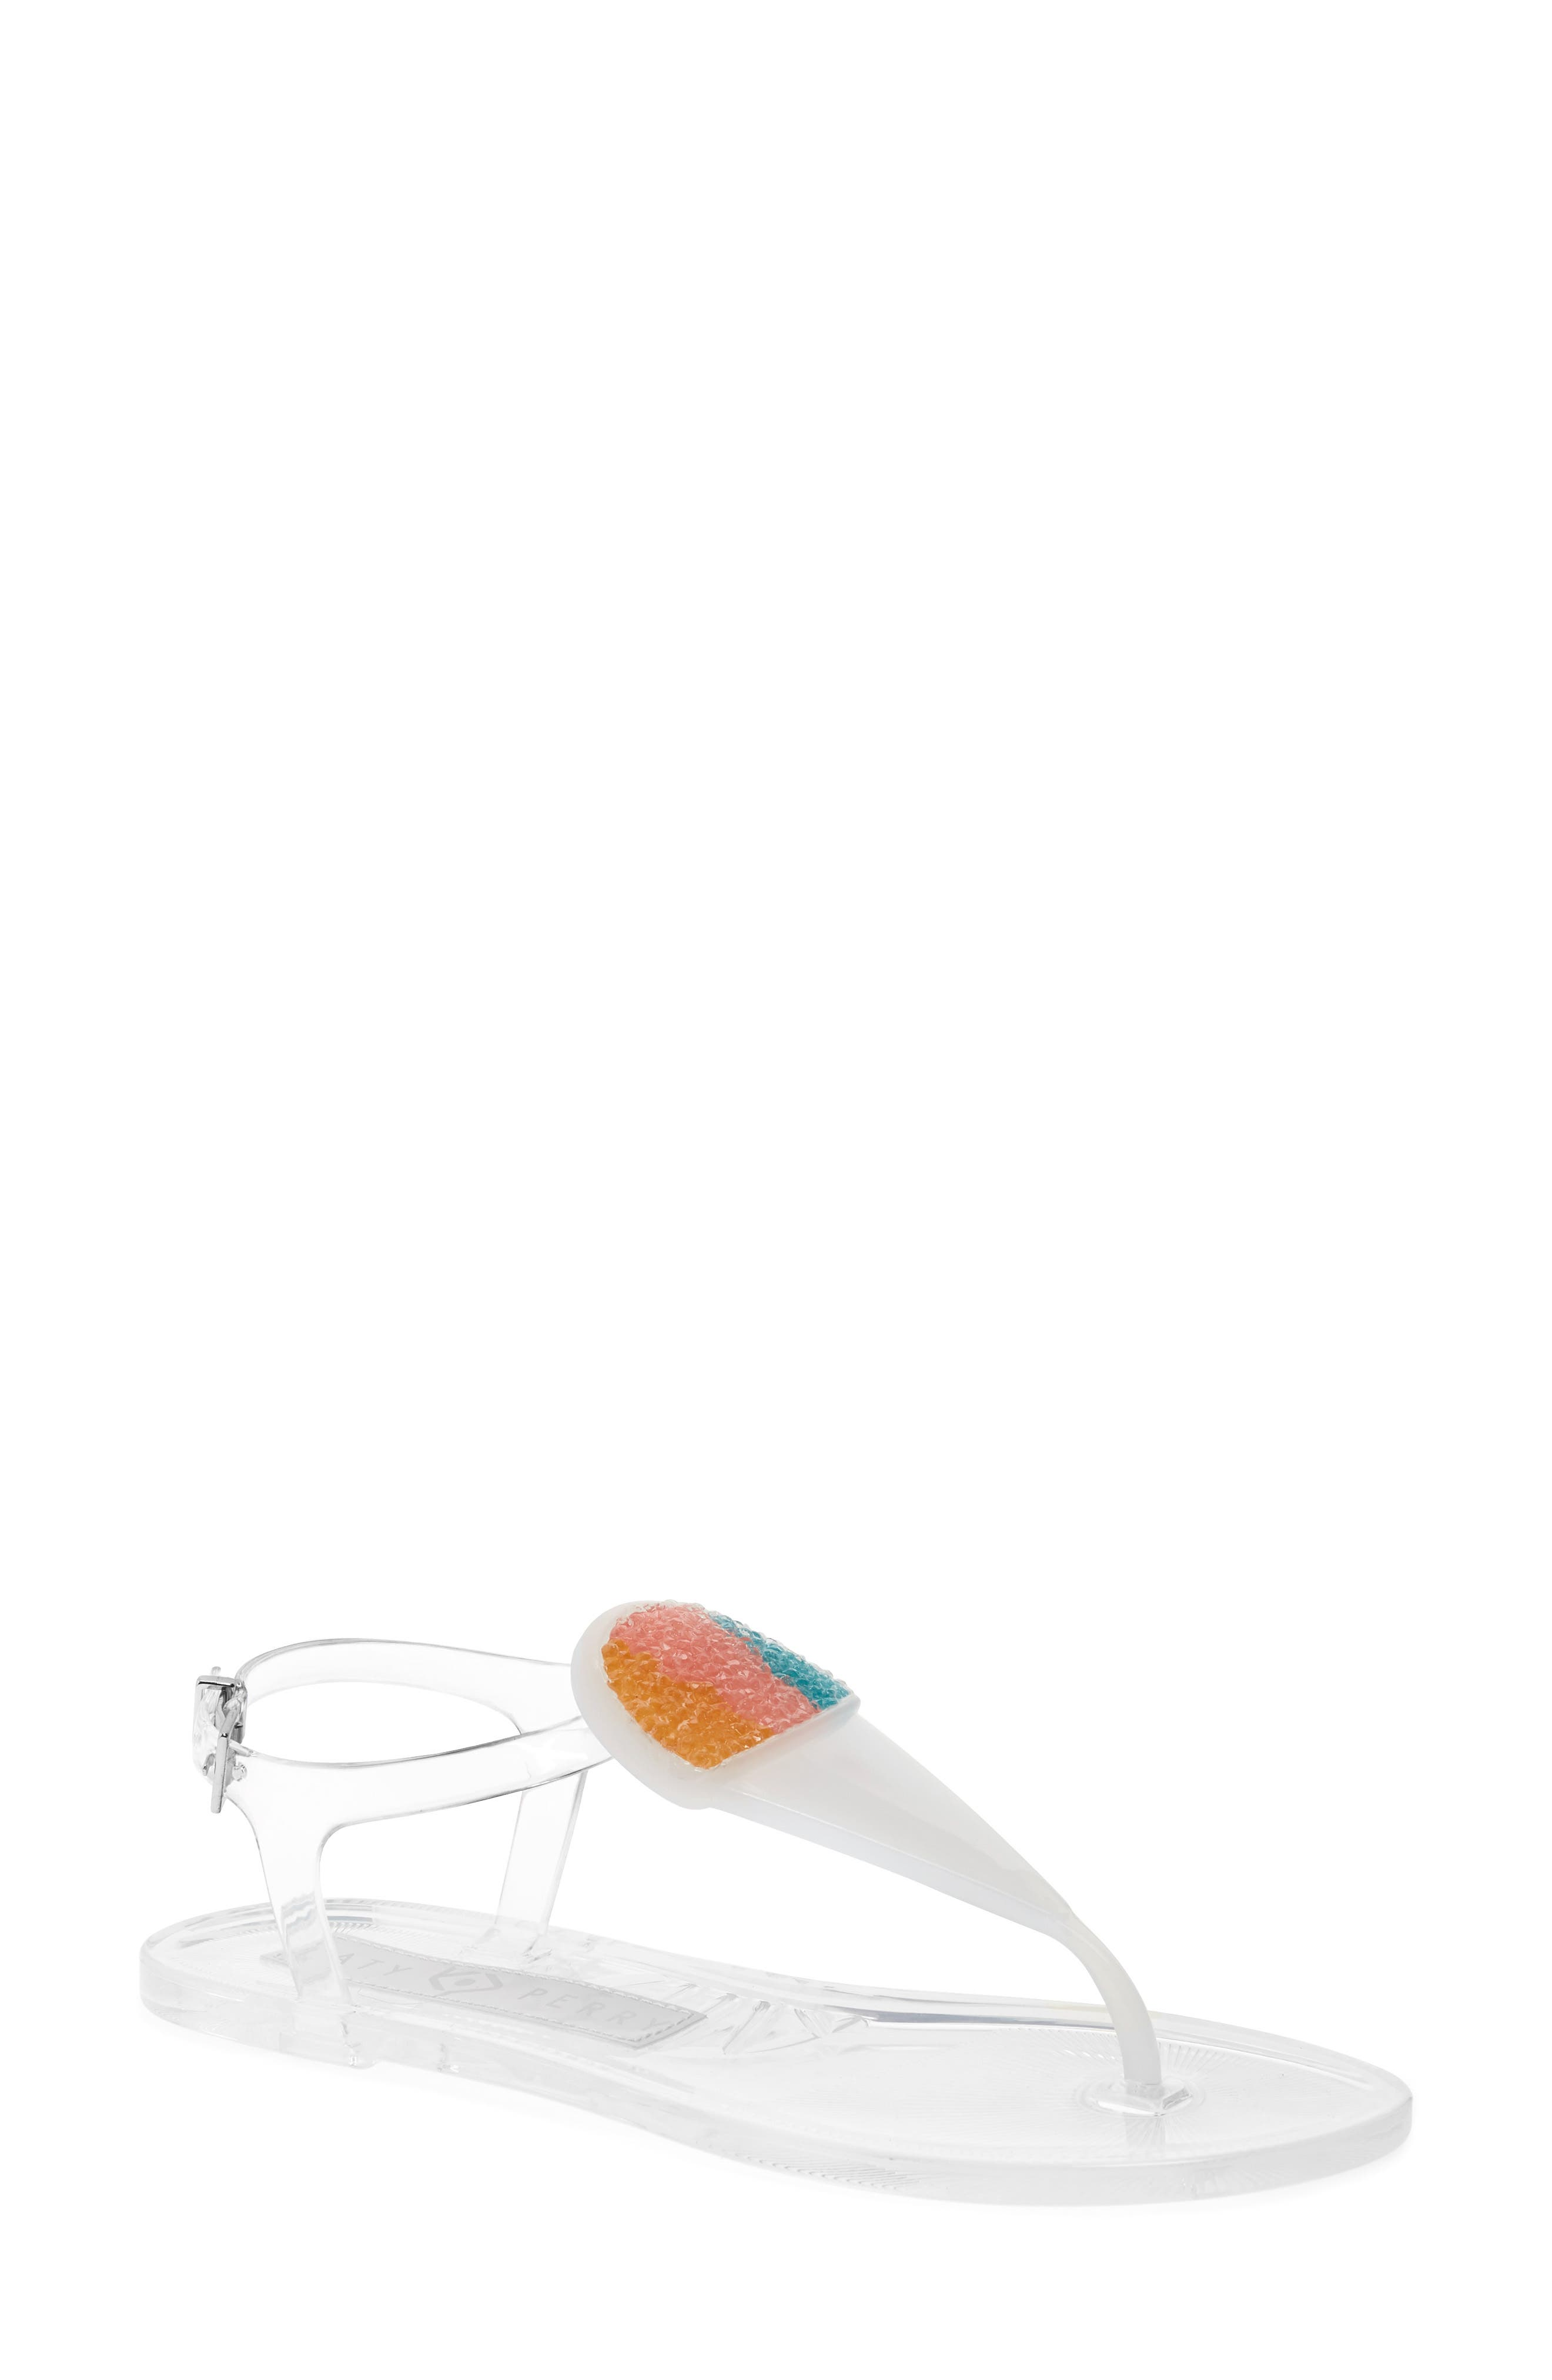 Geli Sandal,                             Main thumbnail 1, color,                             Clear